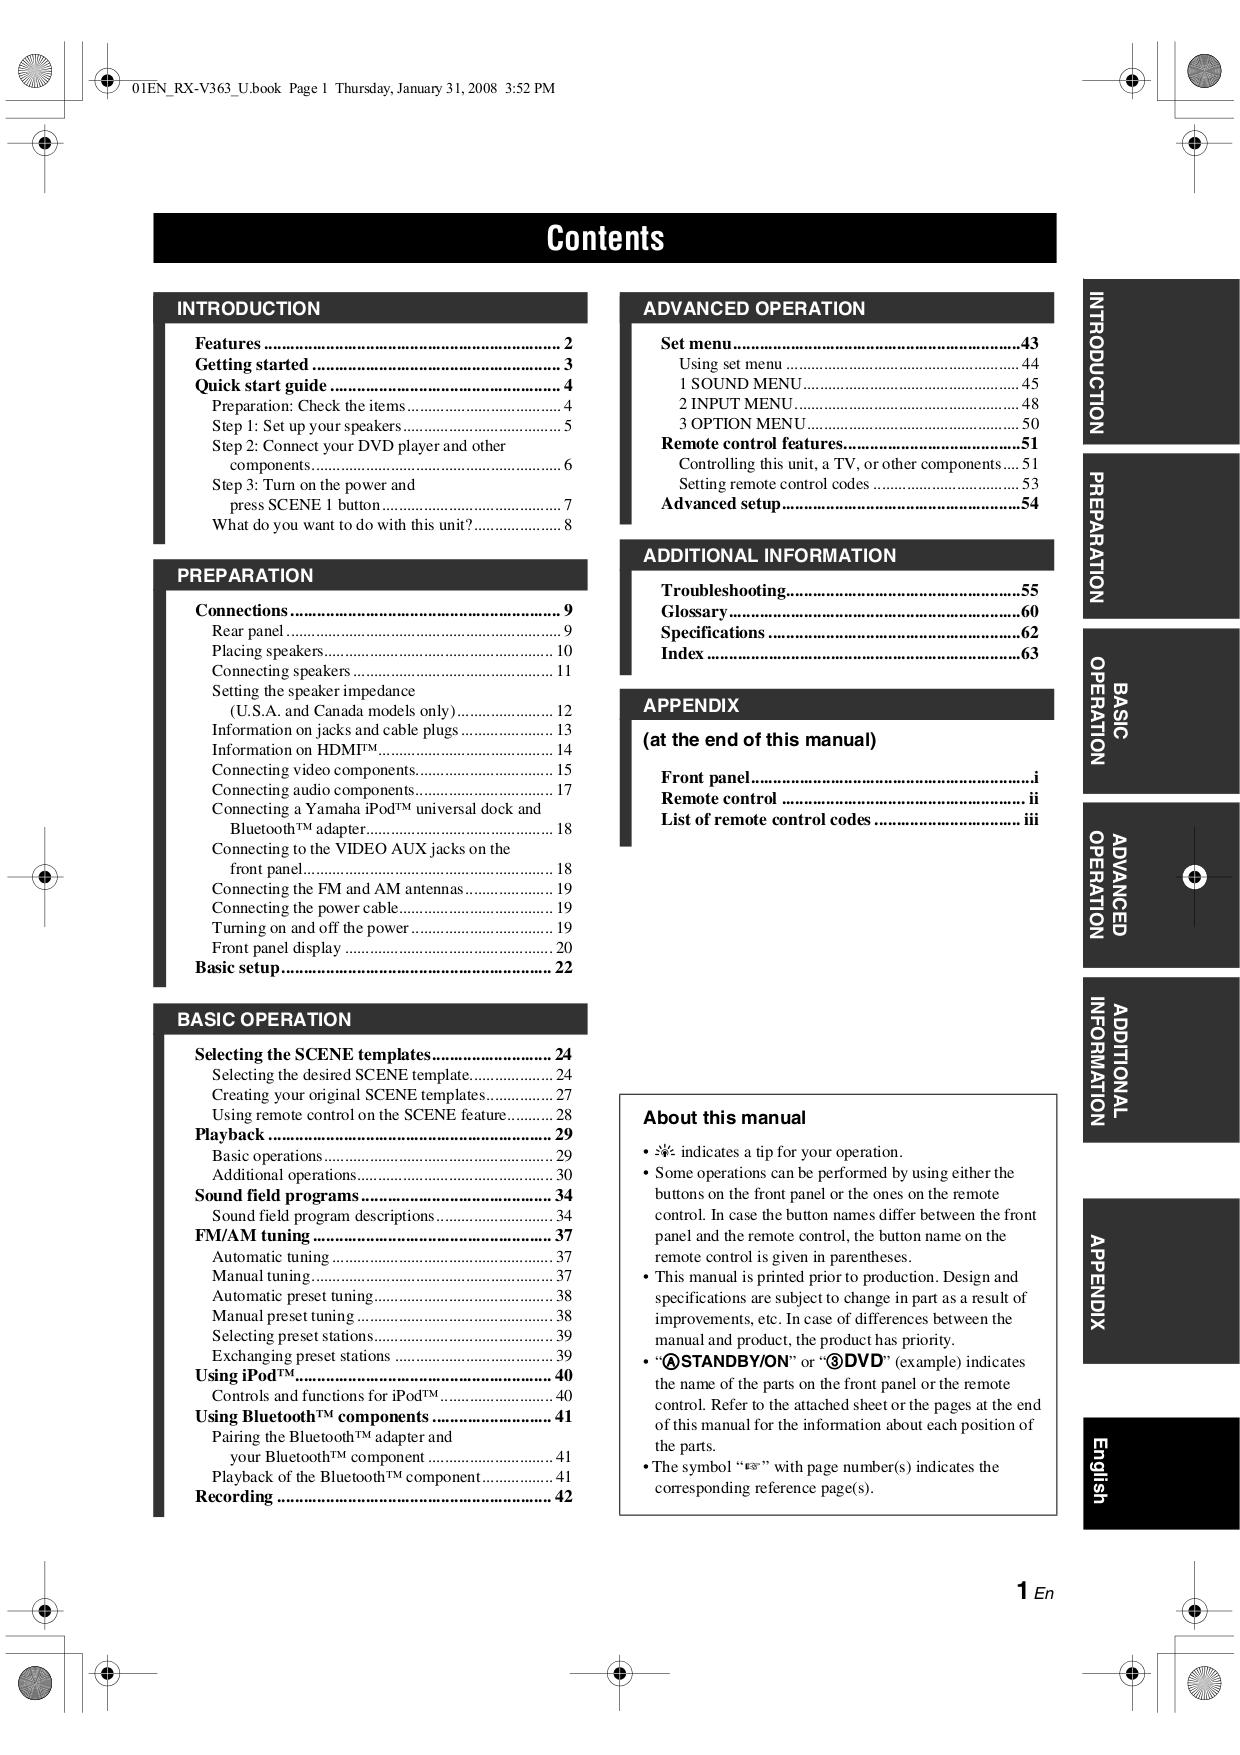 pdf manual for yamaha receiver htr 6130 rh umlib com yamaha htr 6130 manual pdf htr-6130 manual pdf